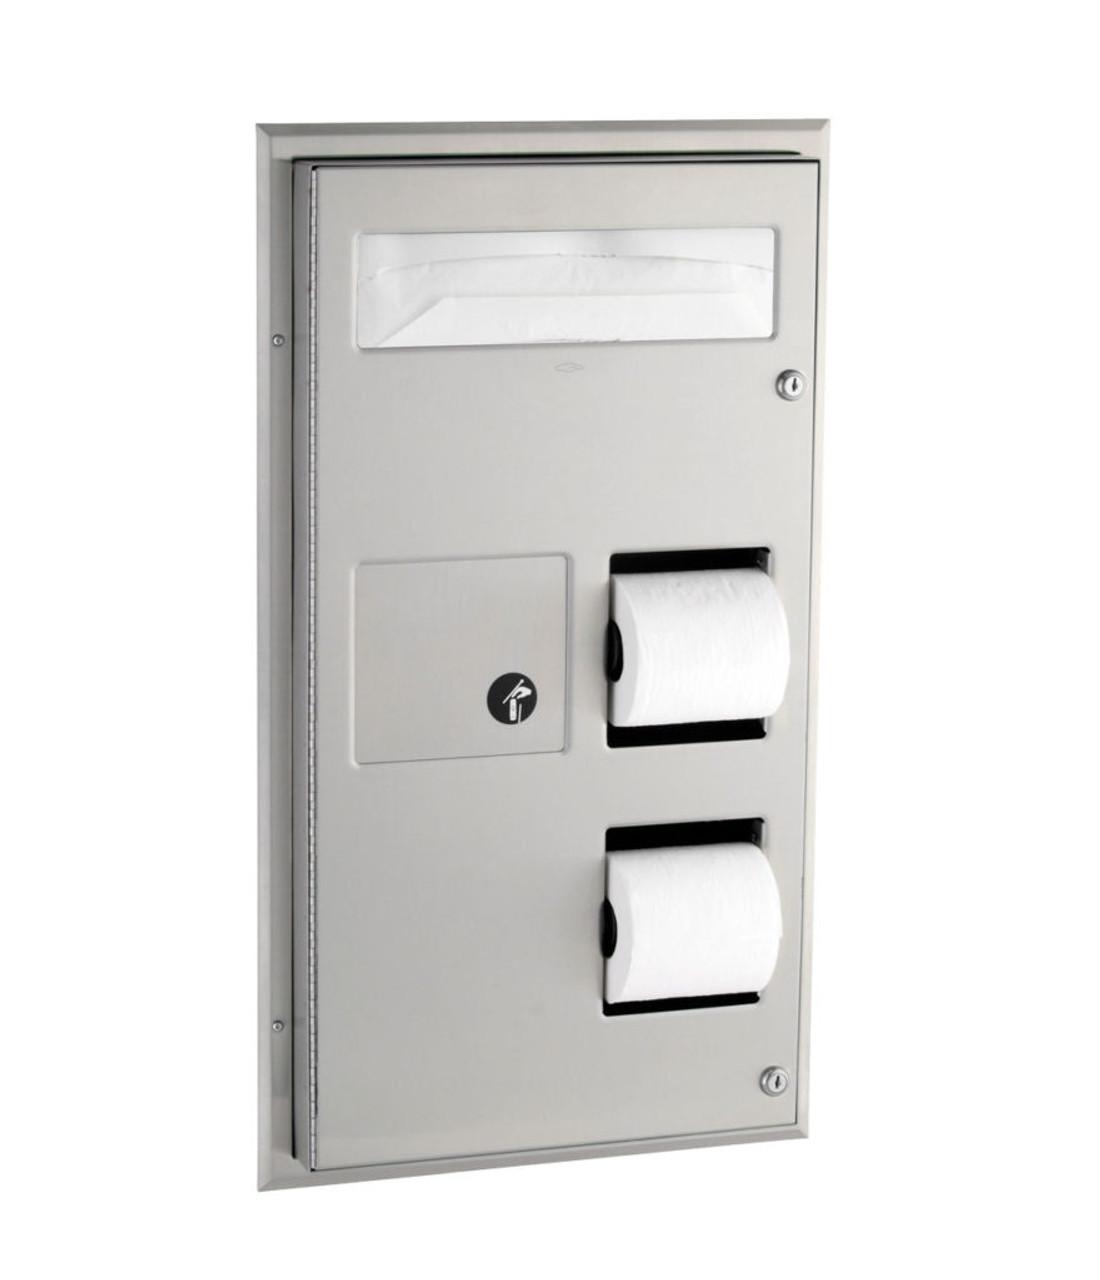 Bobrick B 357 Partition Mounted Seat Cover Dispenser Sanitary Napkin Disposal And Toilet Tissue Dispenser Handy Washroom